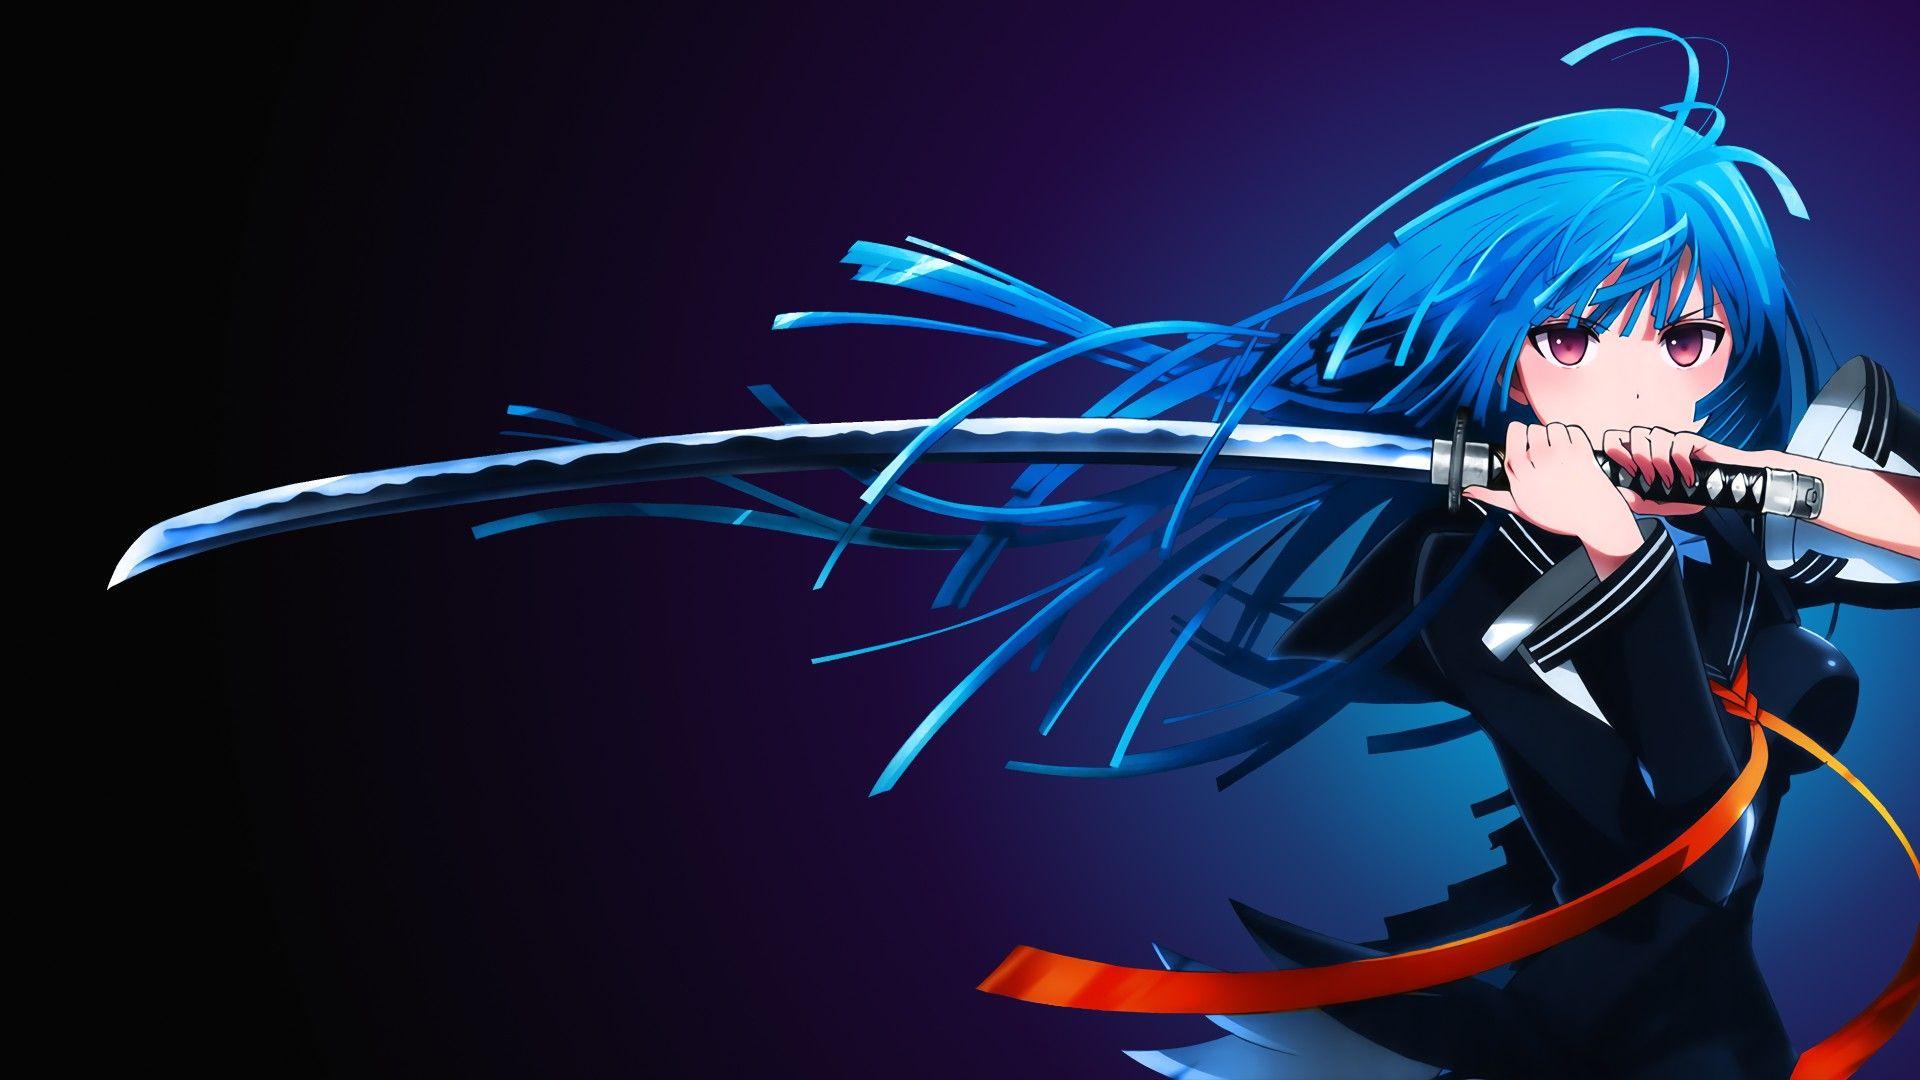 Pin Oleh Em Vonk Di Anime Gambar Anime Gadis Animasi Animasi